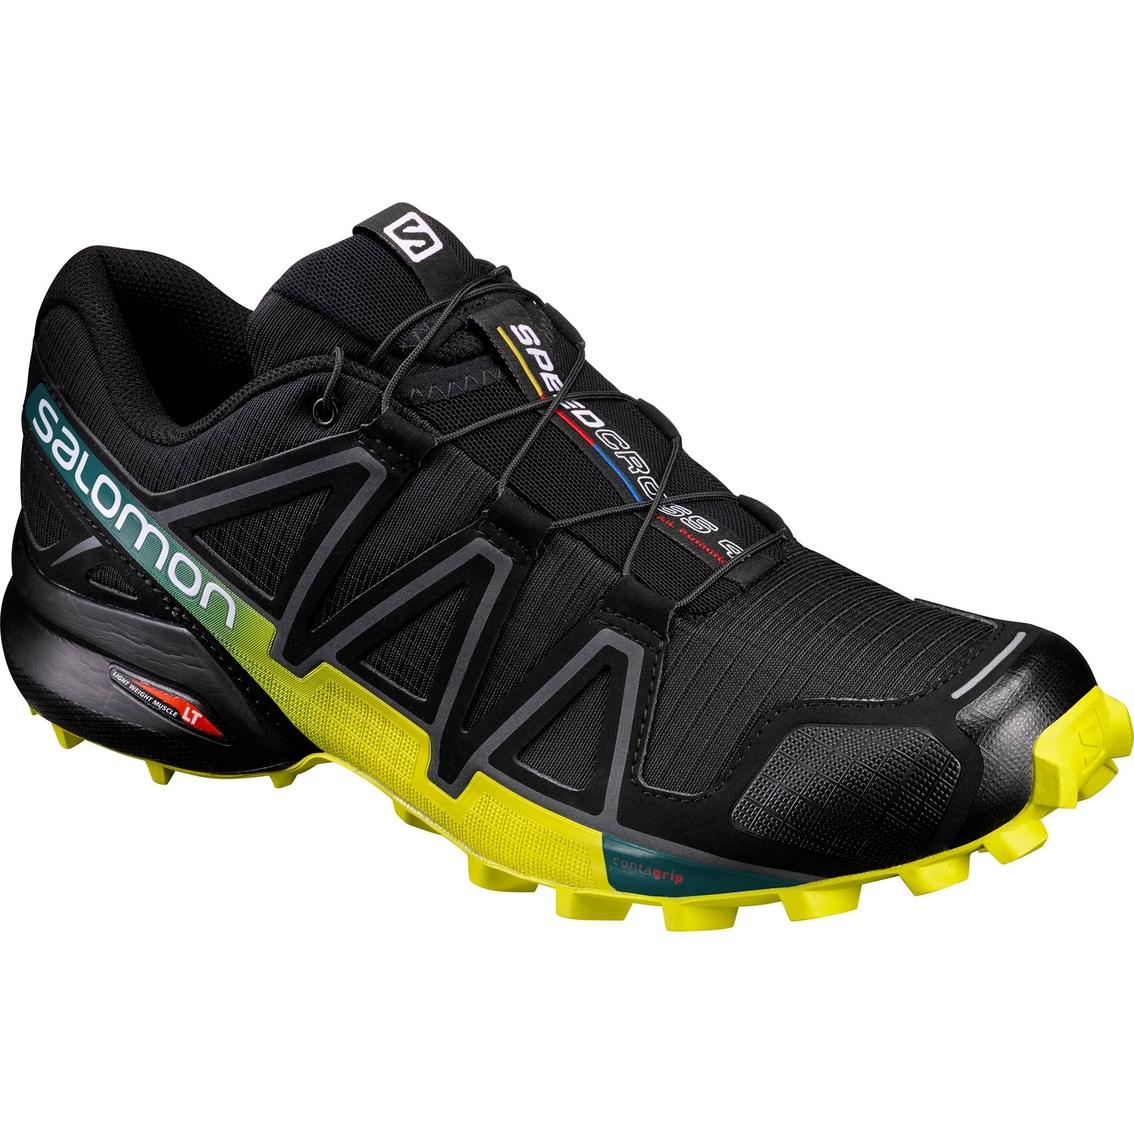 Salomon Men's Speedcross 4 Trail Shoes